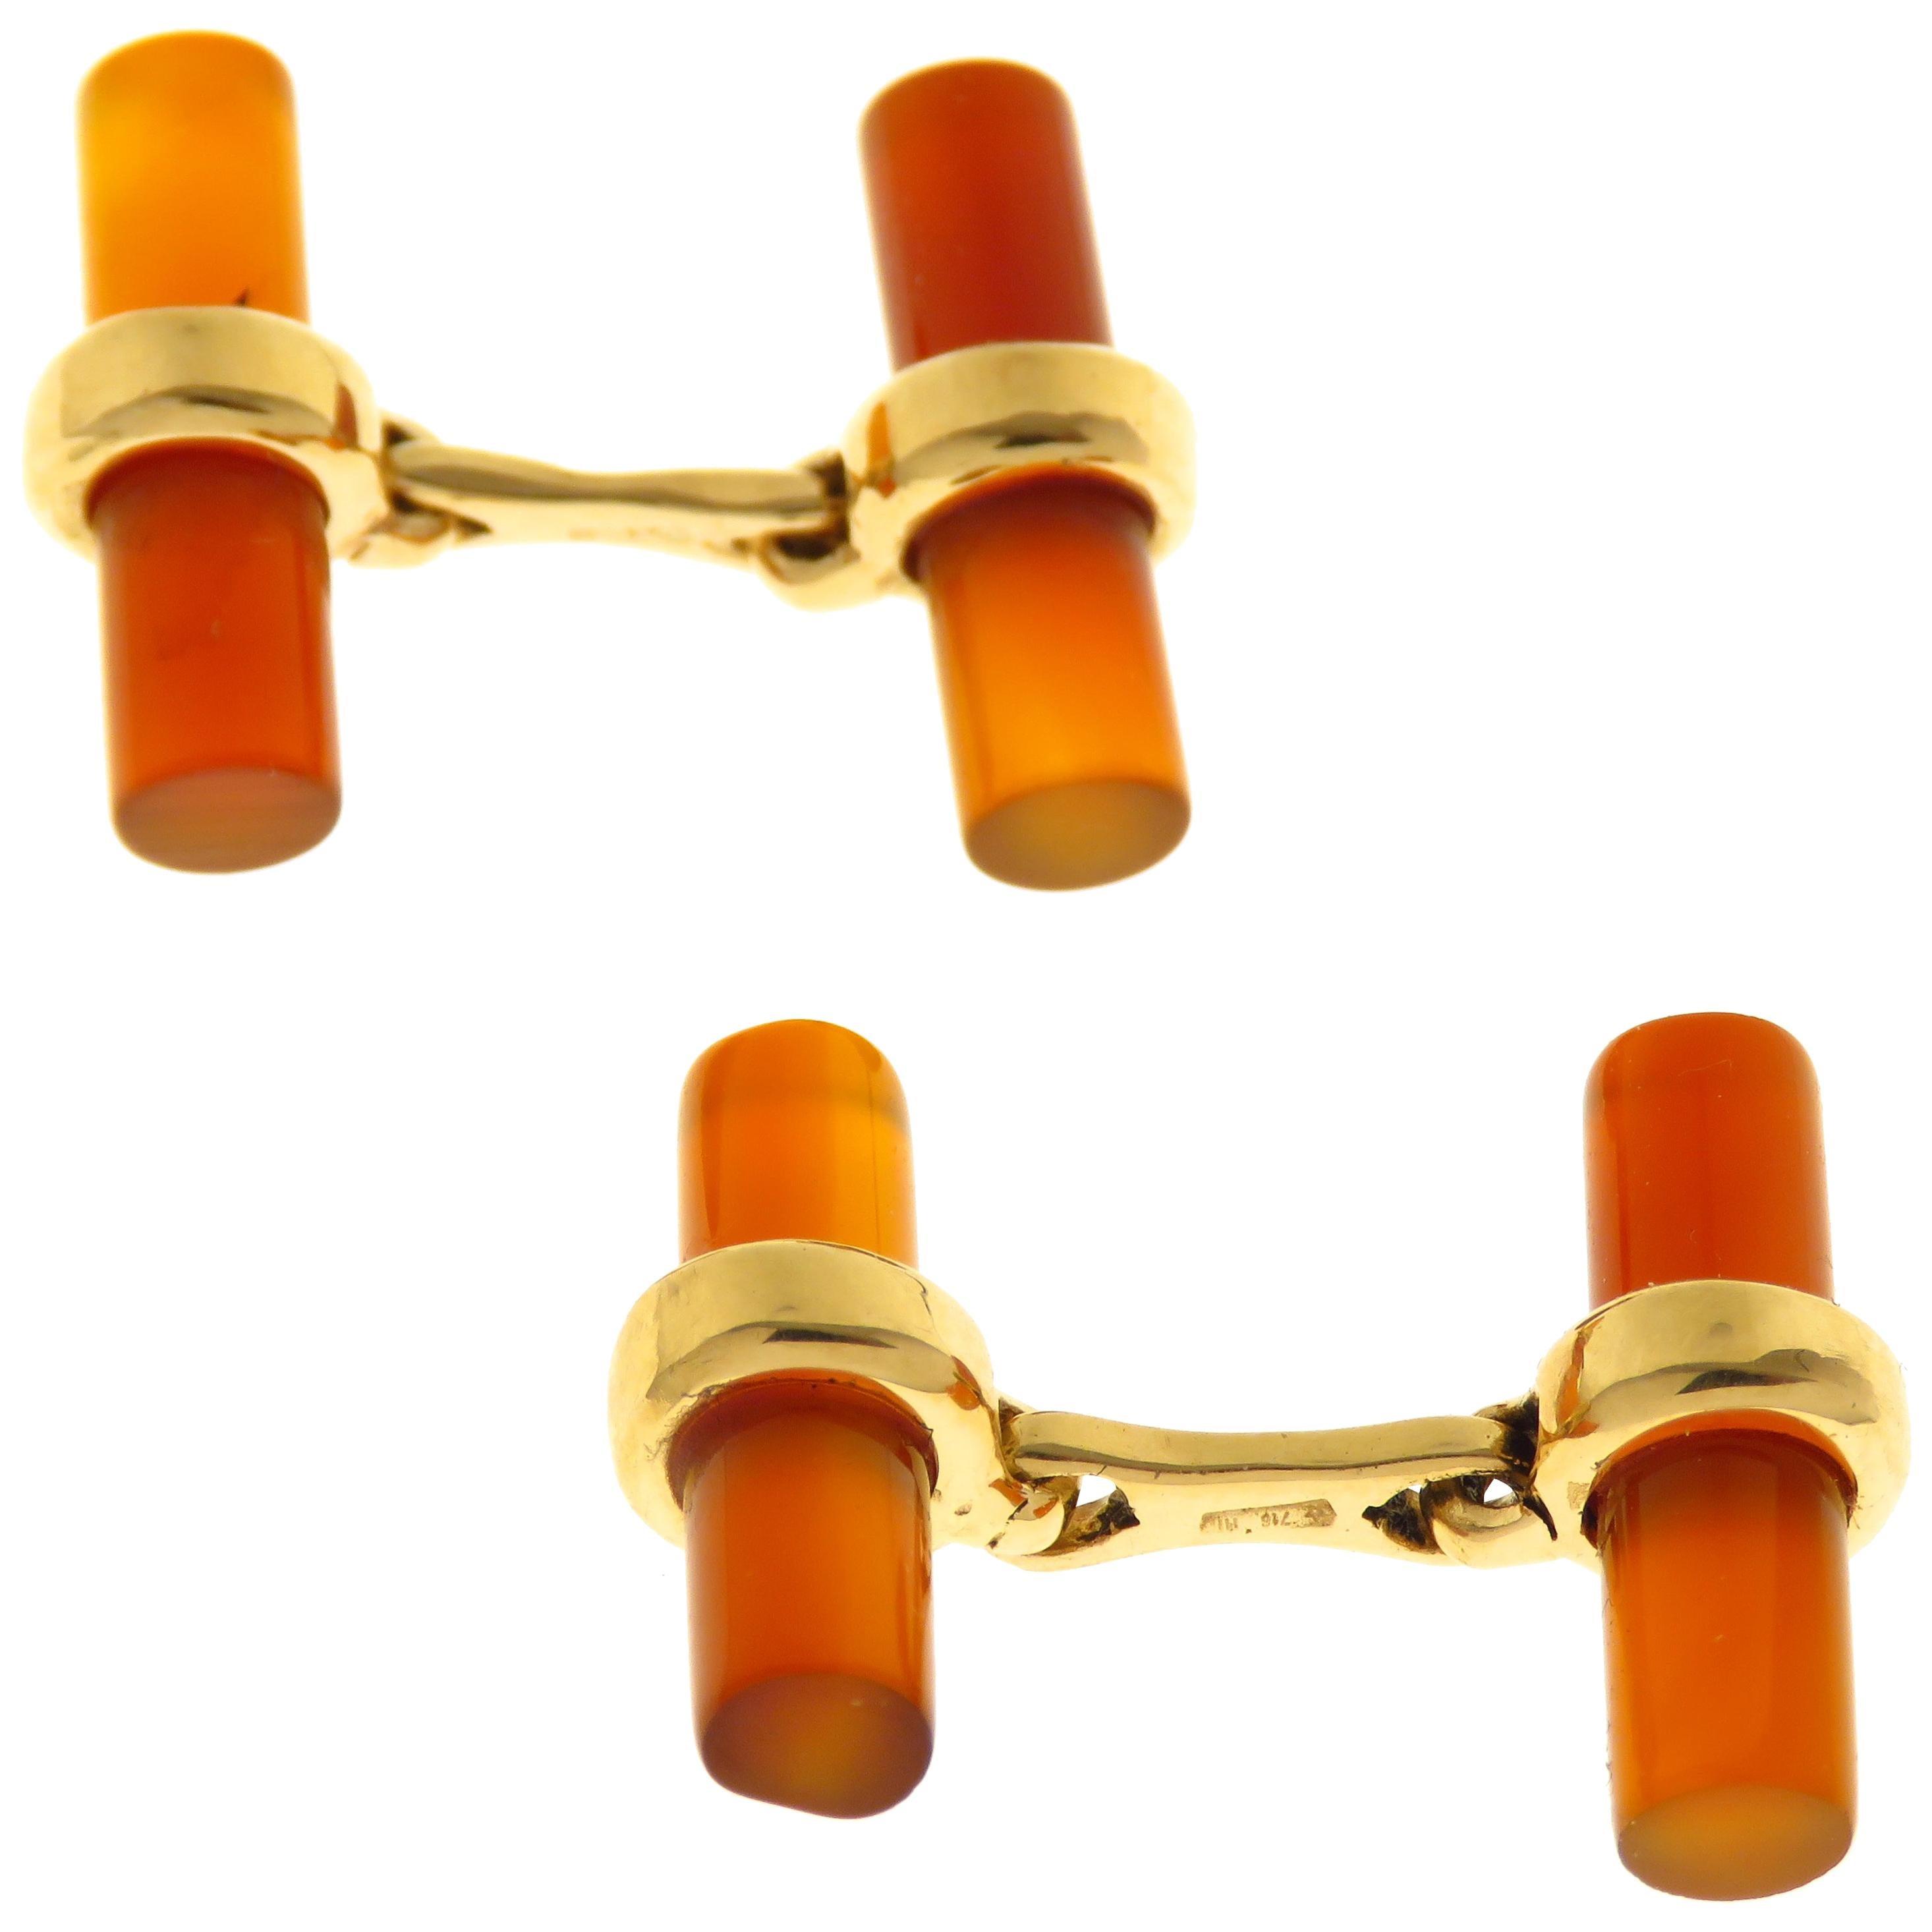 Red Carnelian 9 Karat Rose Gold Bar Cufflinks Handcrafted in Italy